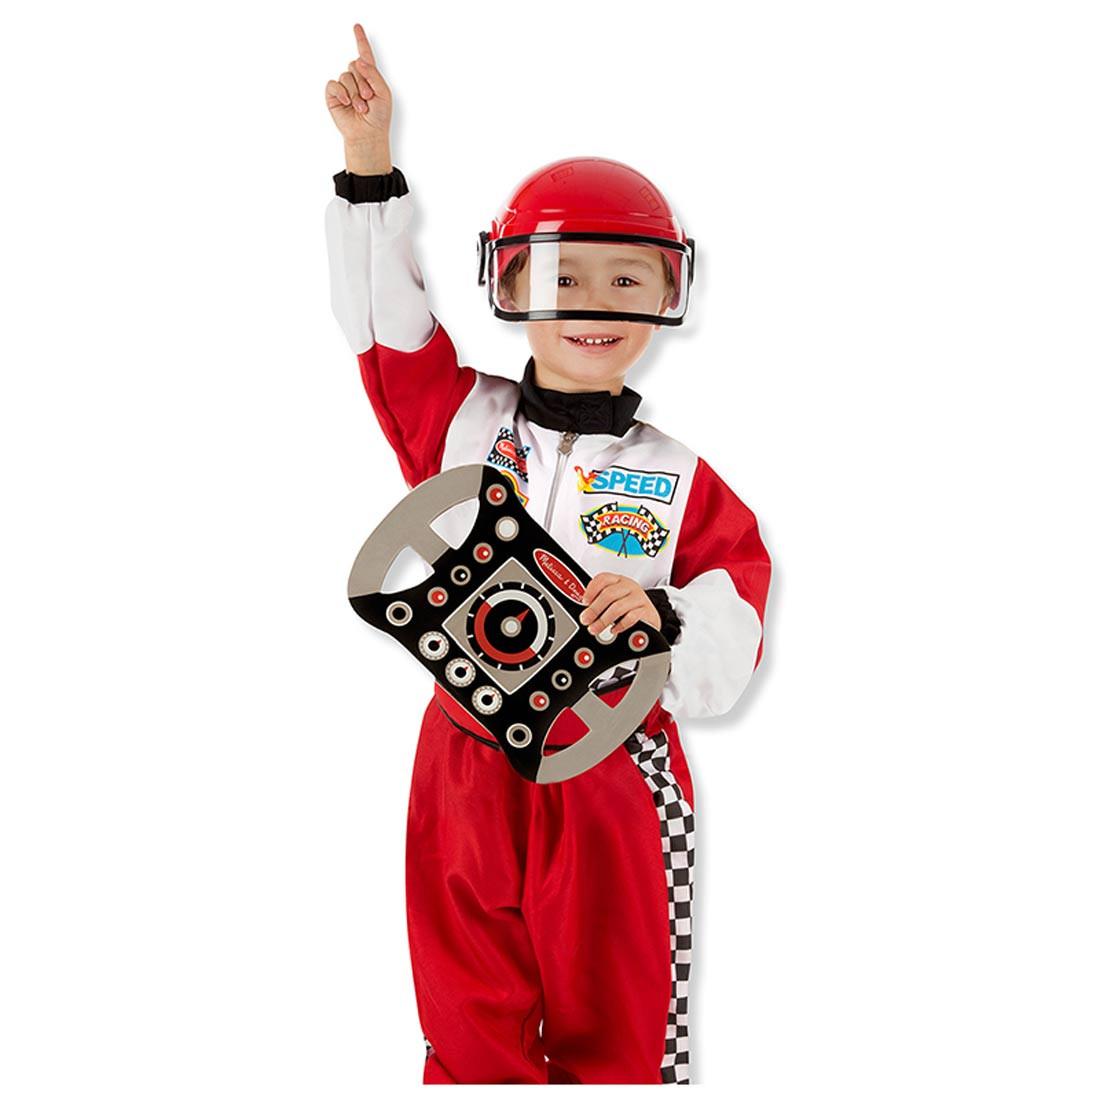 Kit da Pilota di Formula Uno di Melissa Doug - un bel regalo per bambi 4b772e673bfc